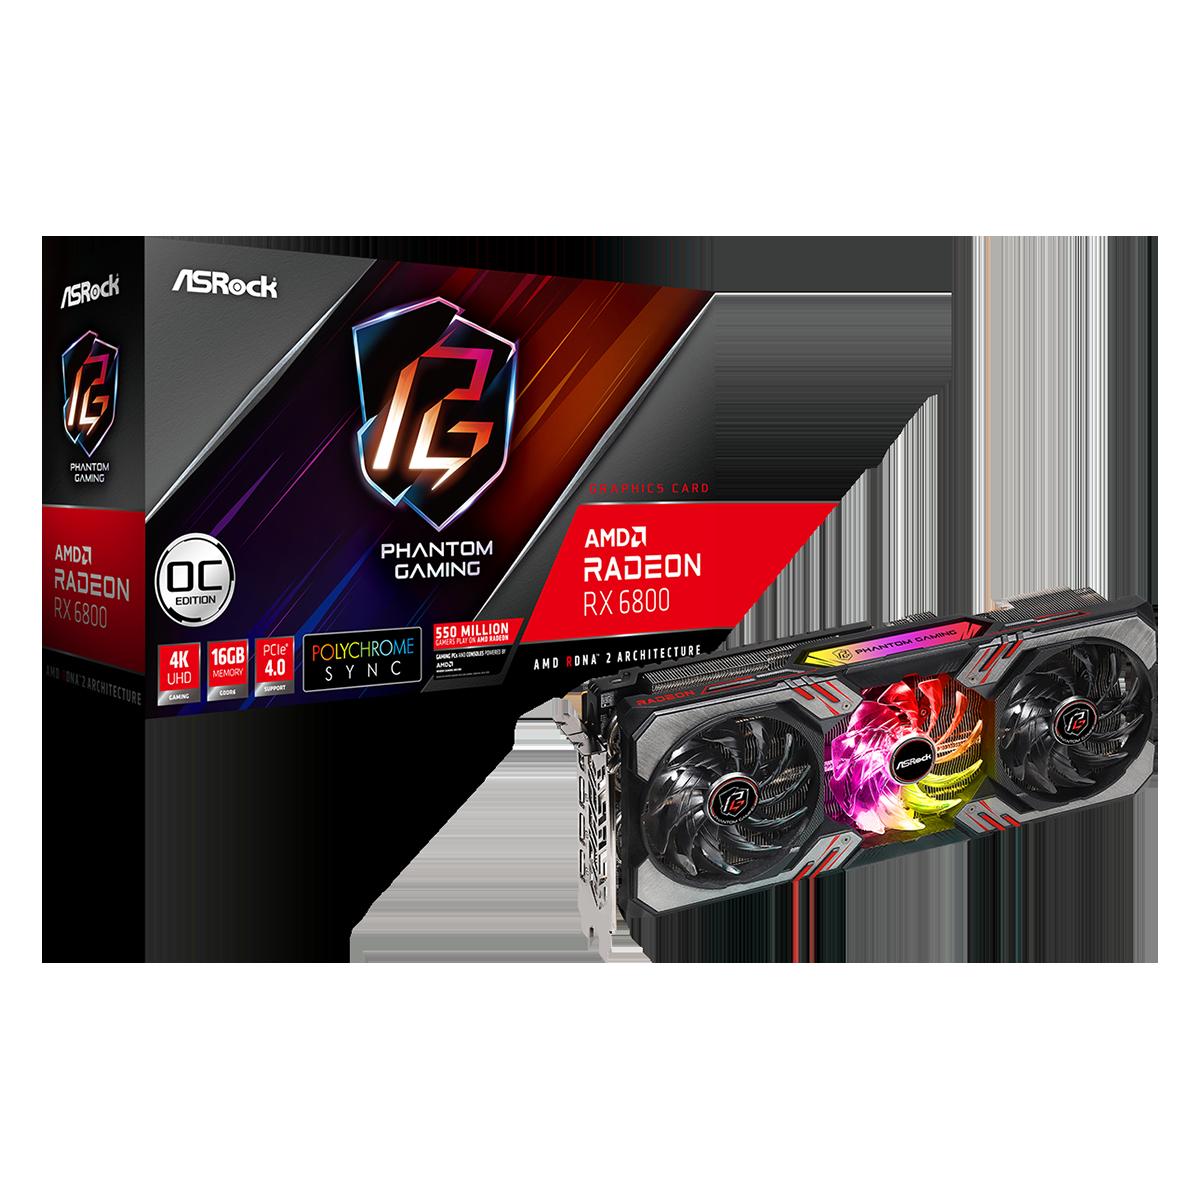 Placa de Vídeo ASRock Radeon RX 6800 Phantom Gaming D OC, 16GB, GDDR6, FSR, Ray Tracing, 90-GA2AZZ-00UANF